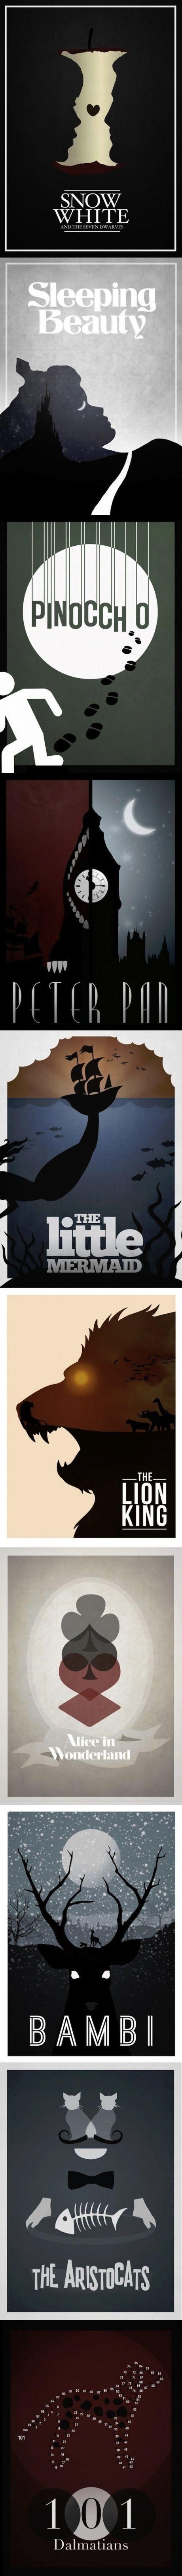 Love this! Disney Minimalism